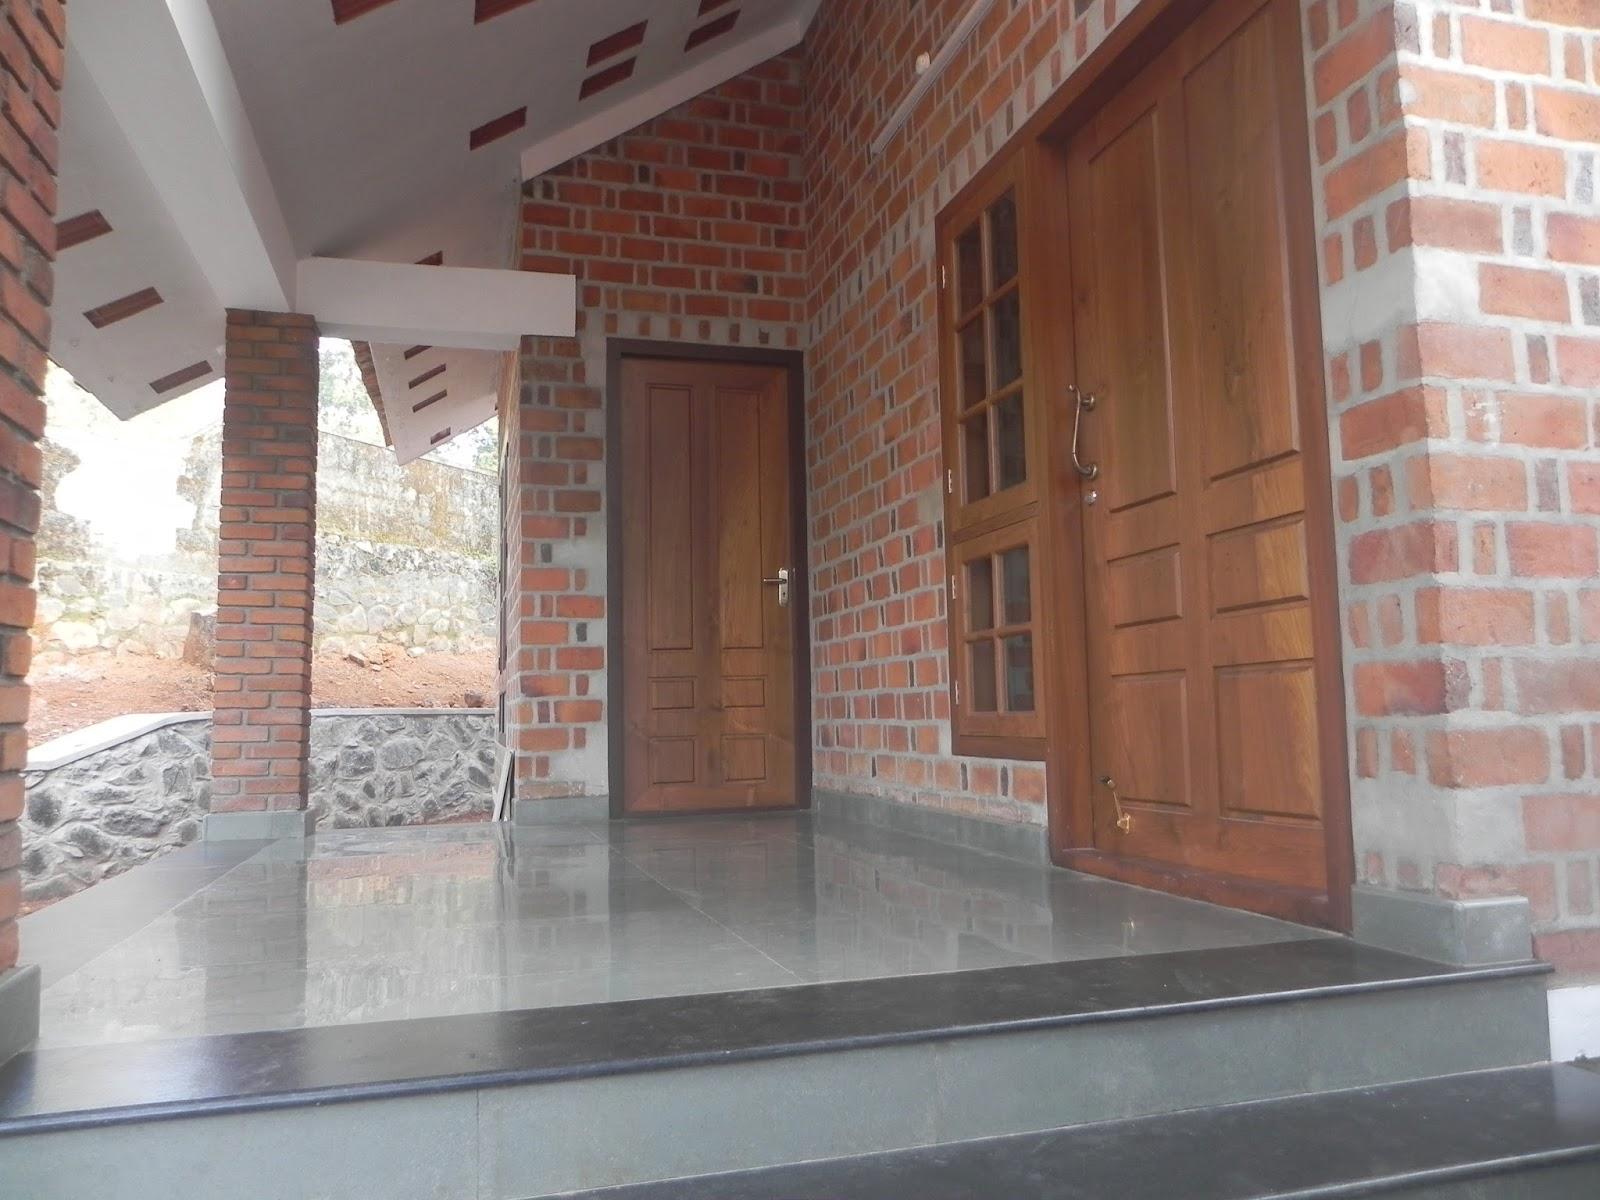 Jorgie Lawyer S Blog Our Green Baker Home Built By